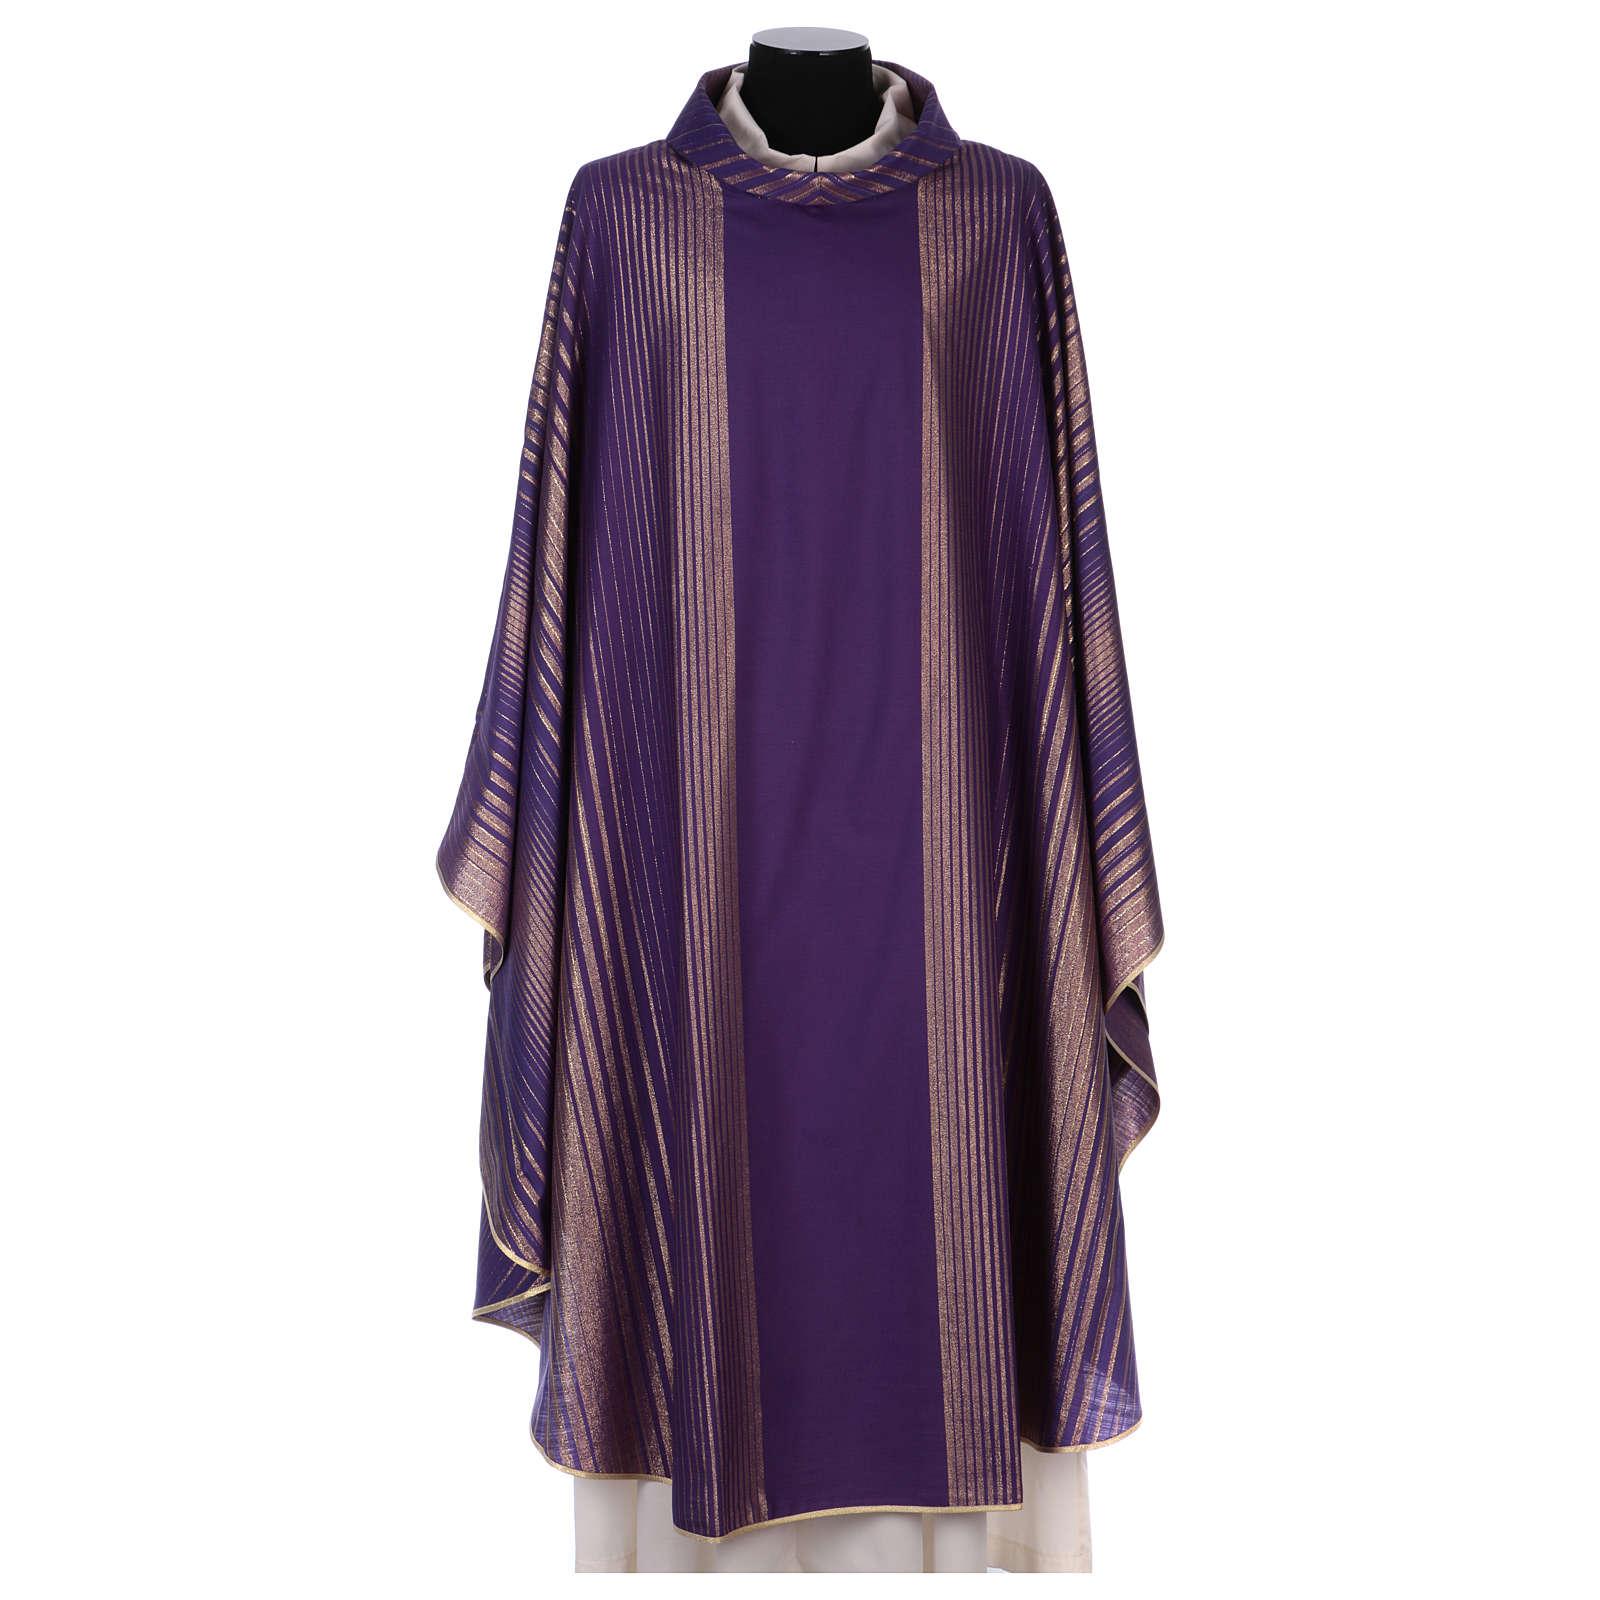 Casula rigata in tessuto lana lurex molto leggero 4